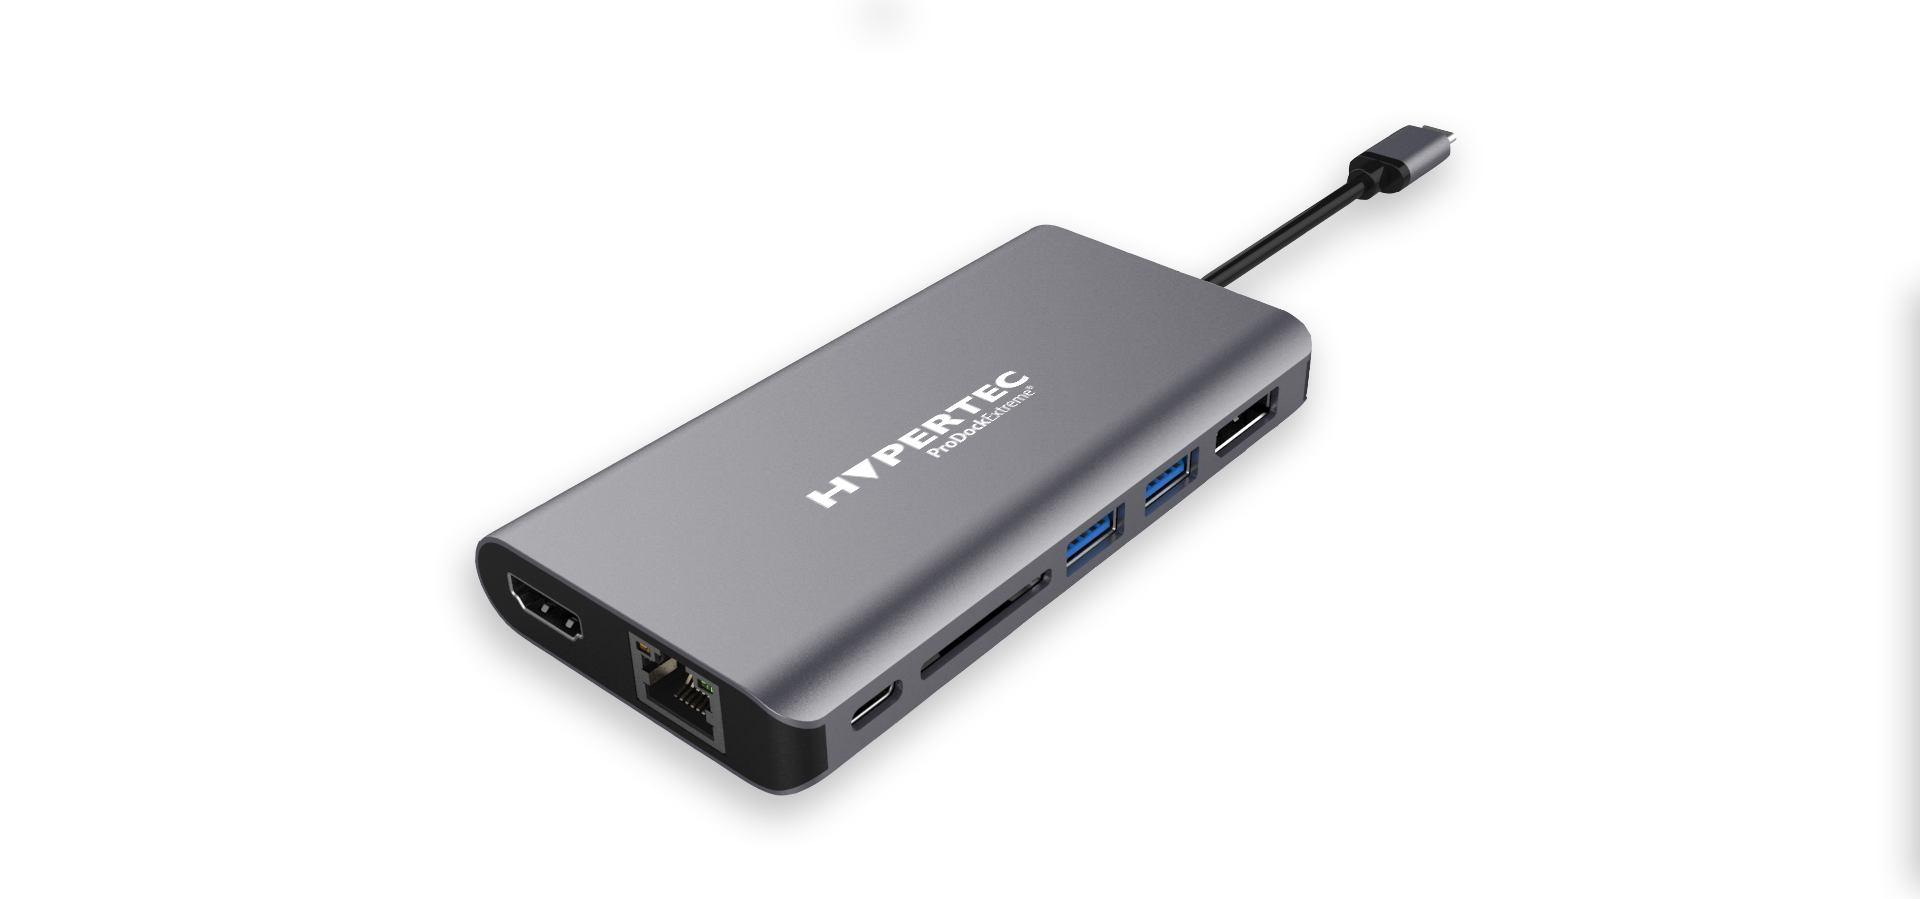 2531225-Hypertec-ProDockExtreme-Universal-USB-C-Dock-with-HDMI-DisplayPort-Du